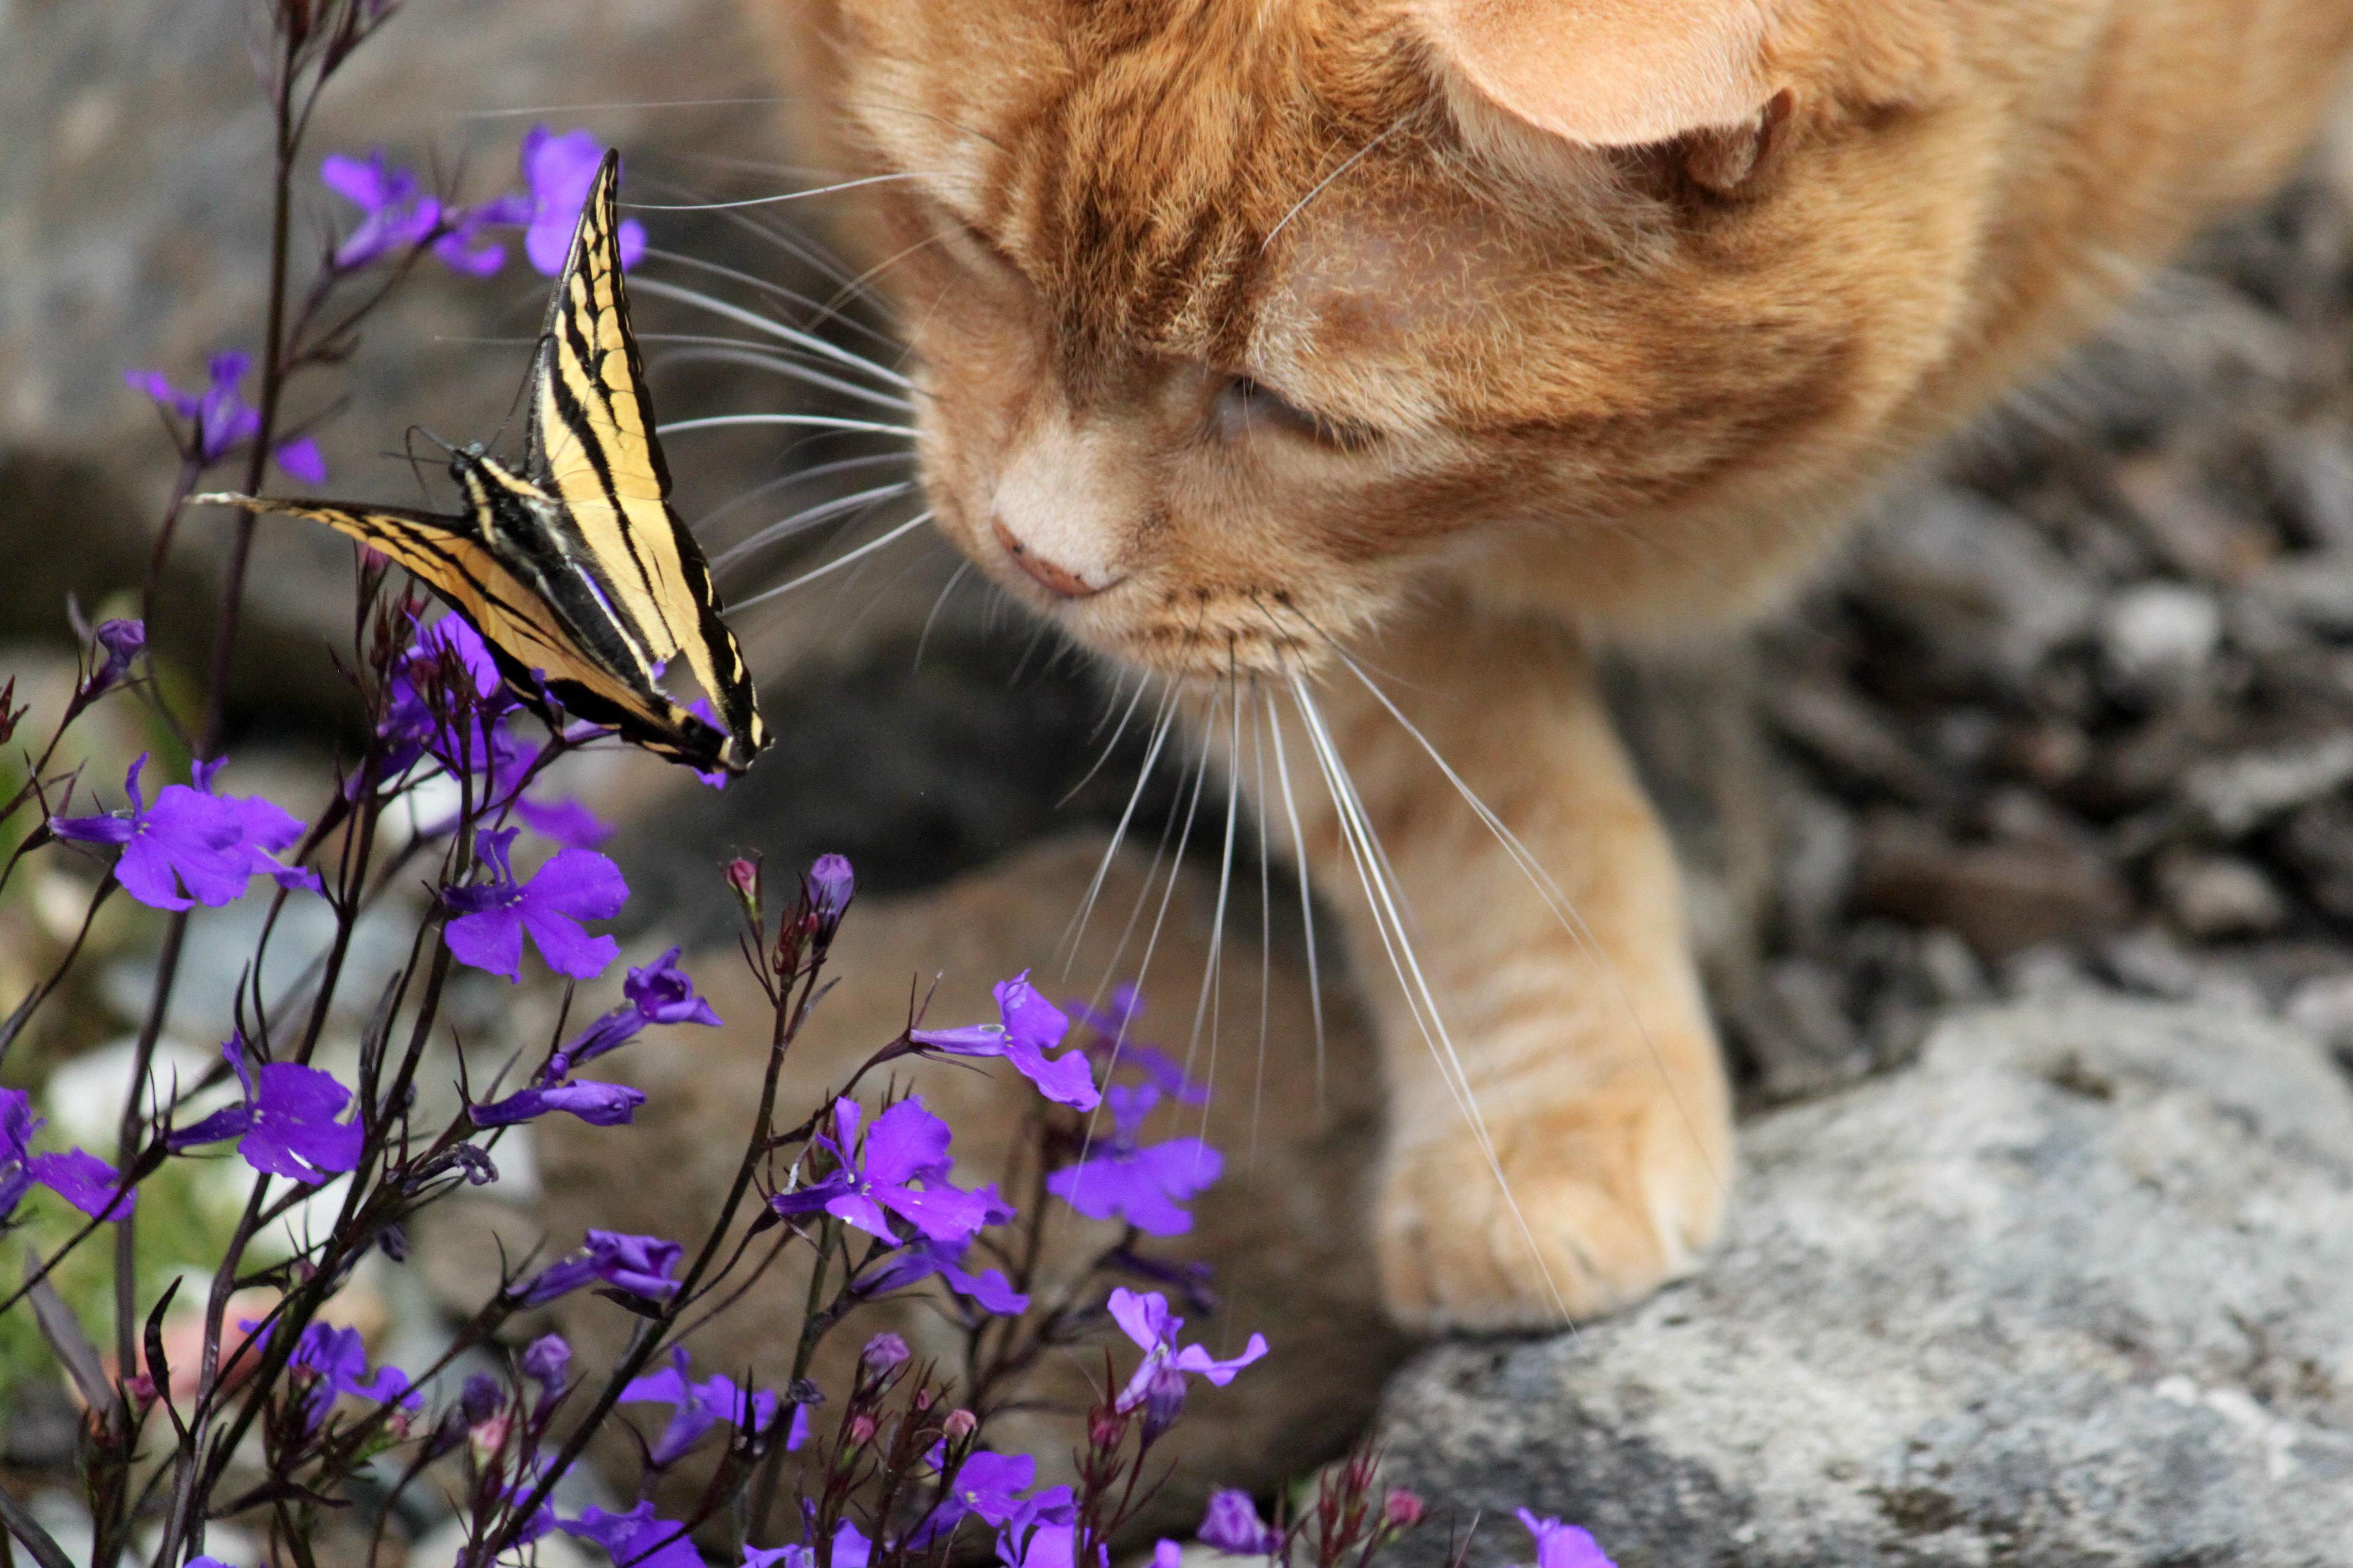 Wallpaper Birthday Flowers Cat Butterfly Garden Jd